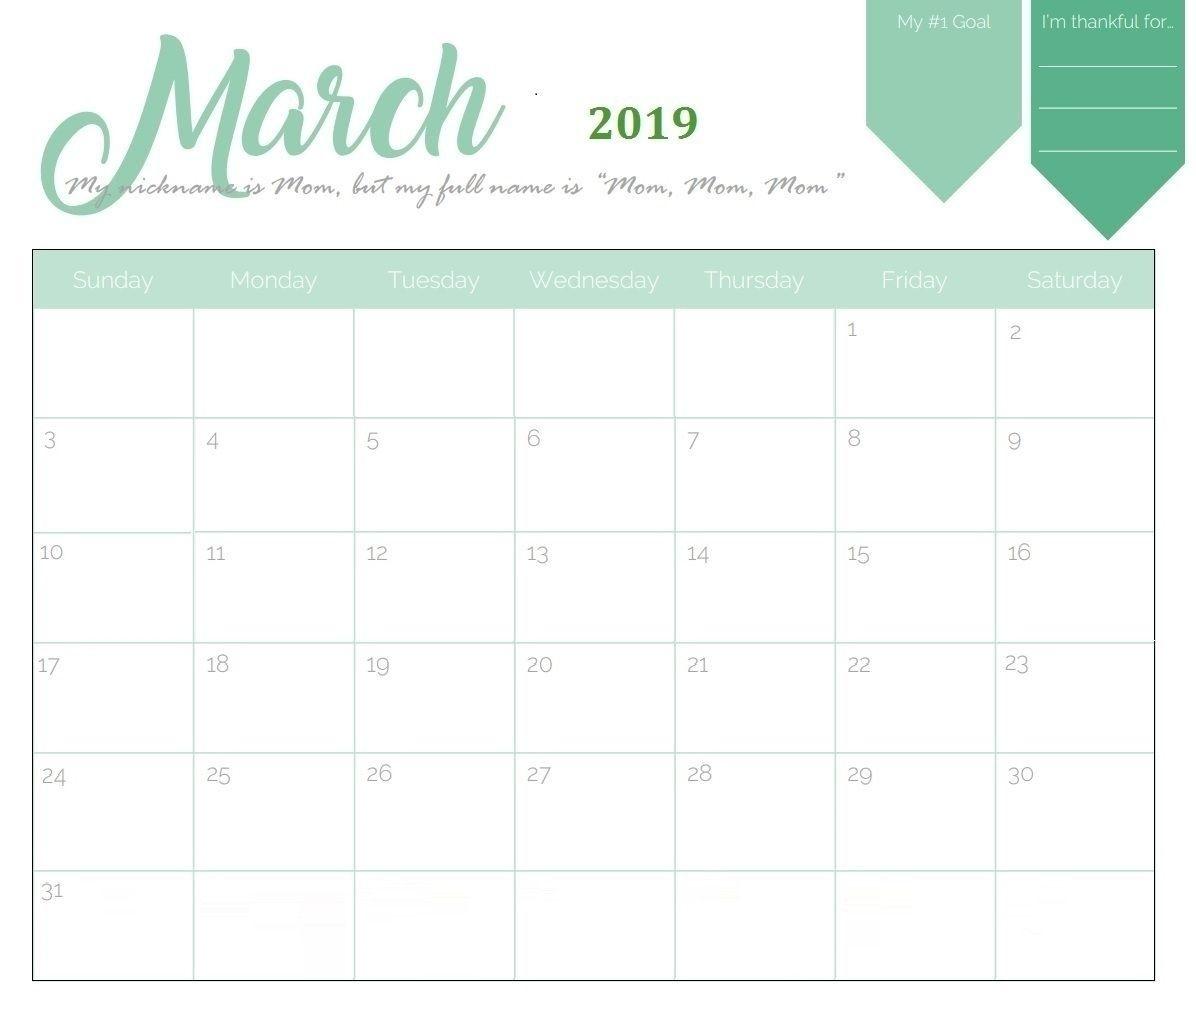 August 2019 Calendar Free Printable Imom – Template Calendar with 2020 Calendar Free Printable Imom